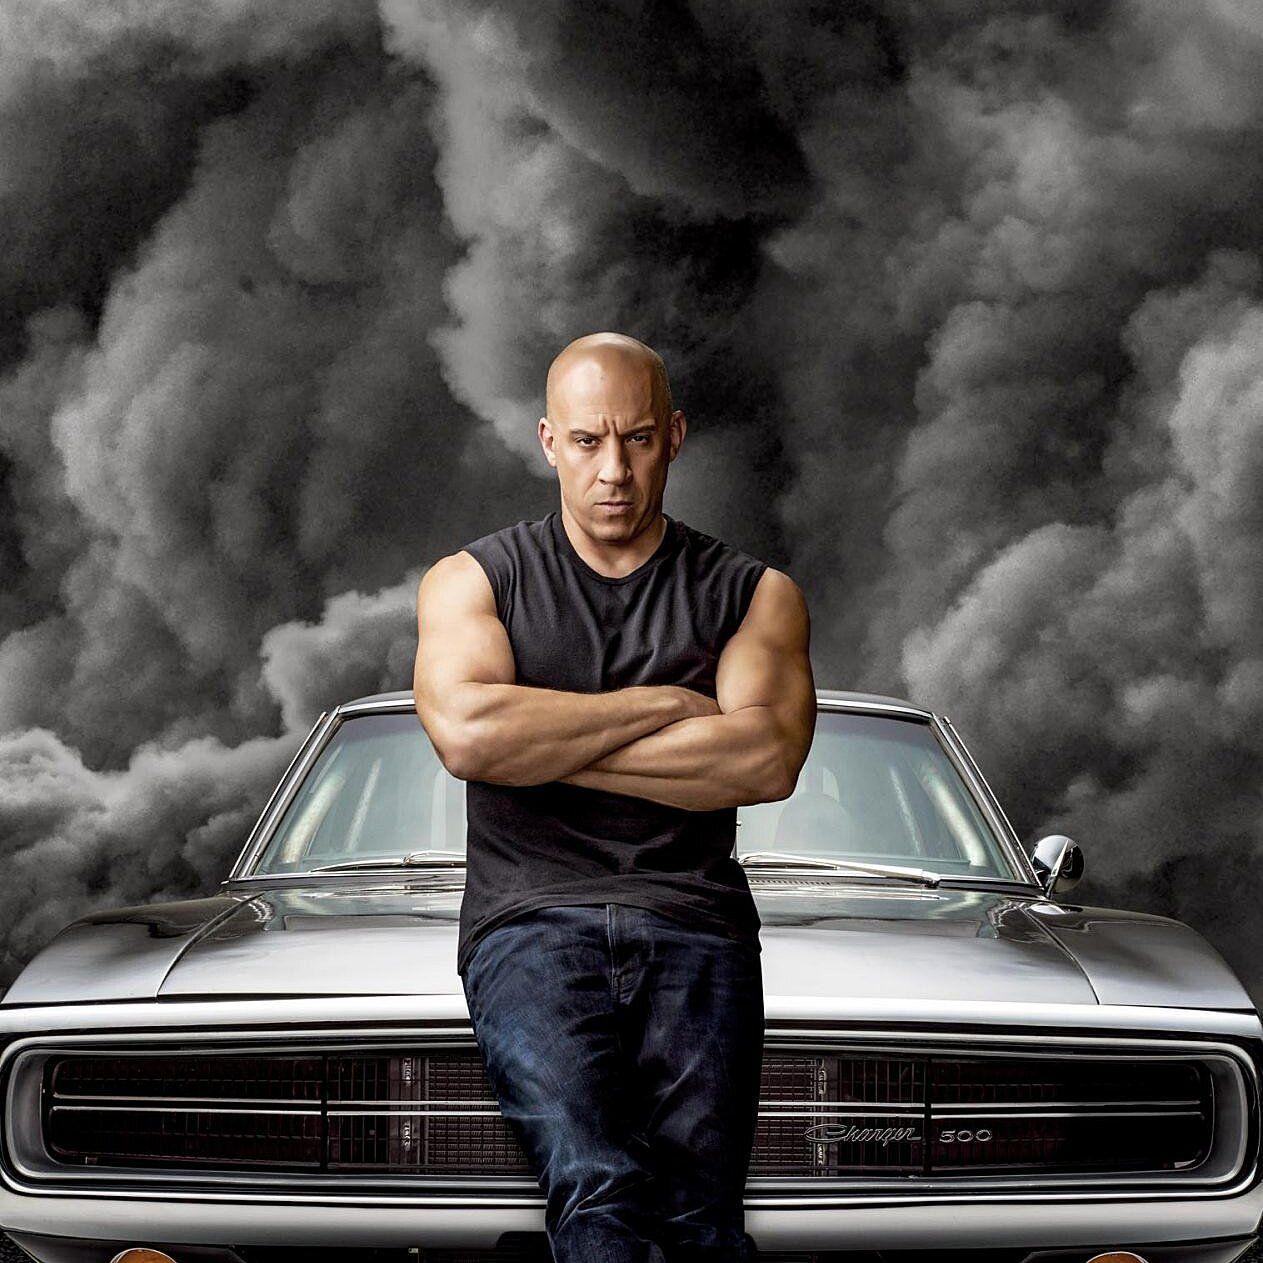 Vin Diesel John Cena Bring The Smoke In Fast Furious 9 Posters Fast And Furious 9 Vin Diesel Fast And Furious